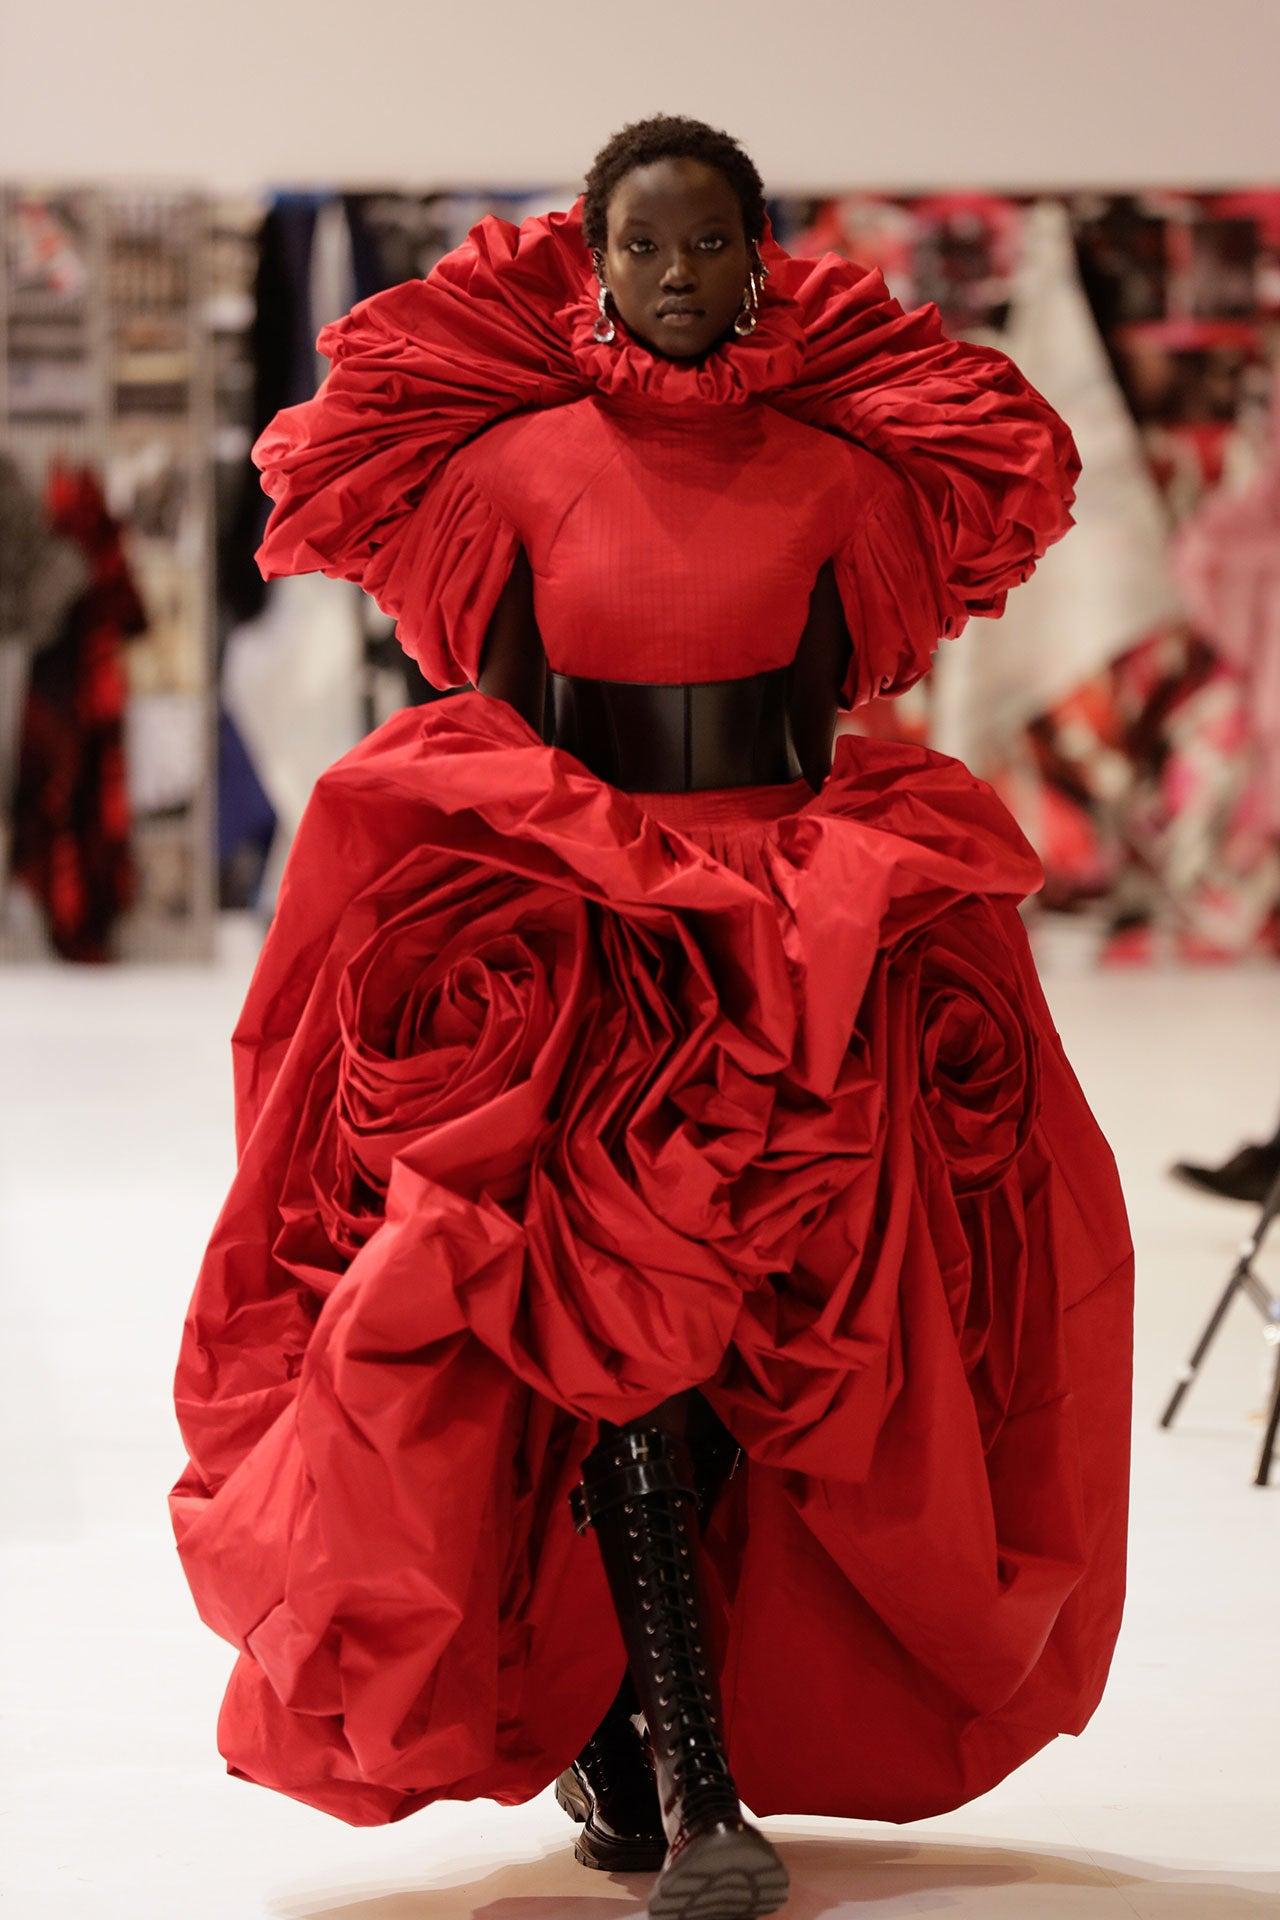 Modelka Anok Yai předvádí Rose Dress z kolekce Alexander McQueen podzim 2019. Autor: Bernhard Deckert/Courtesy of Alexander McQueen